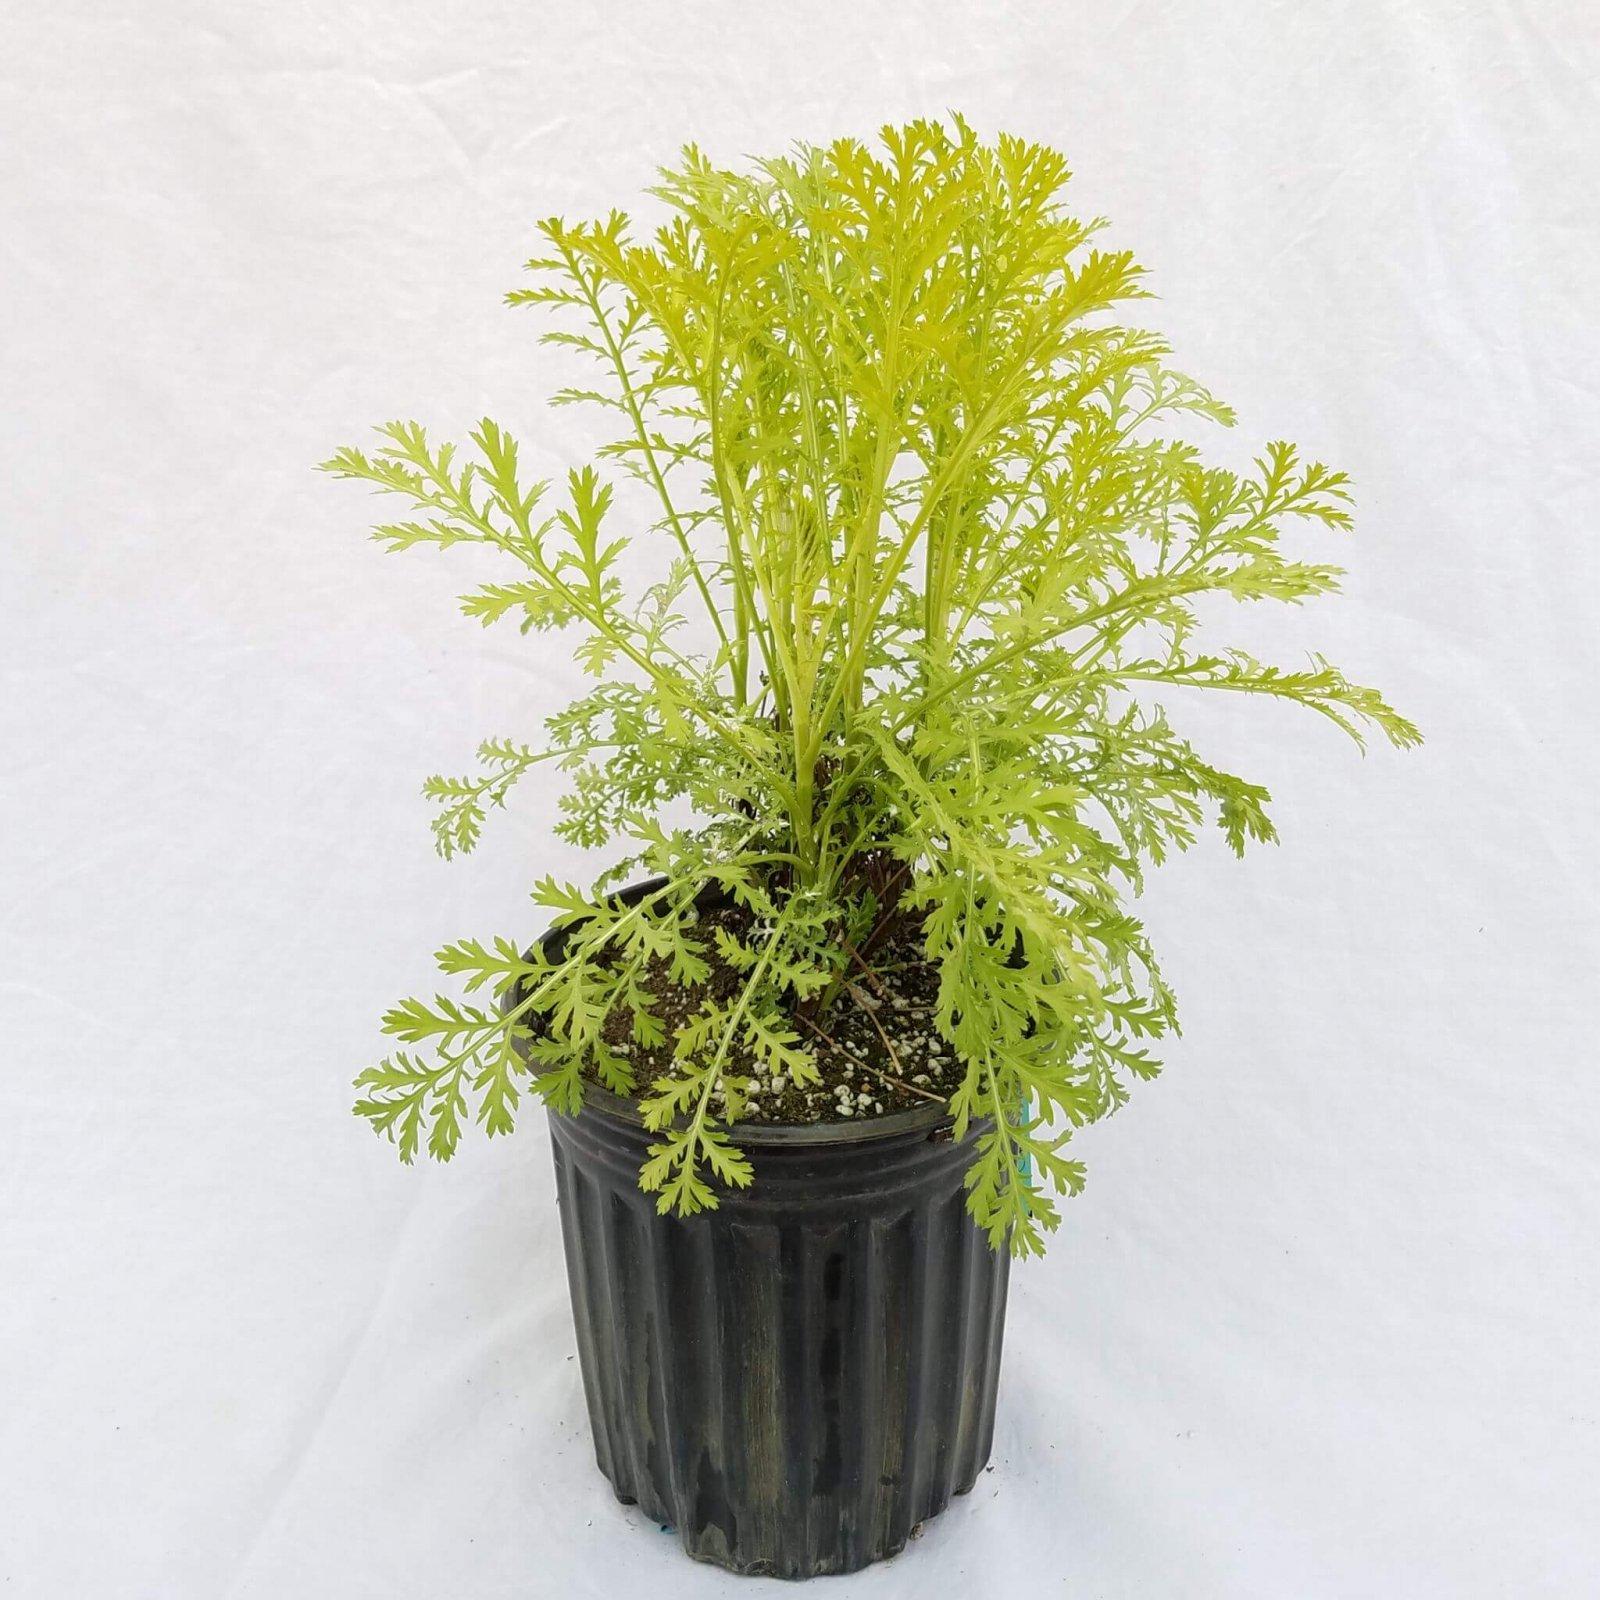 Tanacetum vulgare 'Isla Gold' - #1